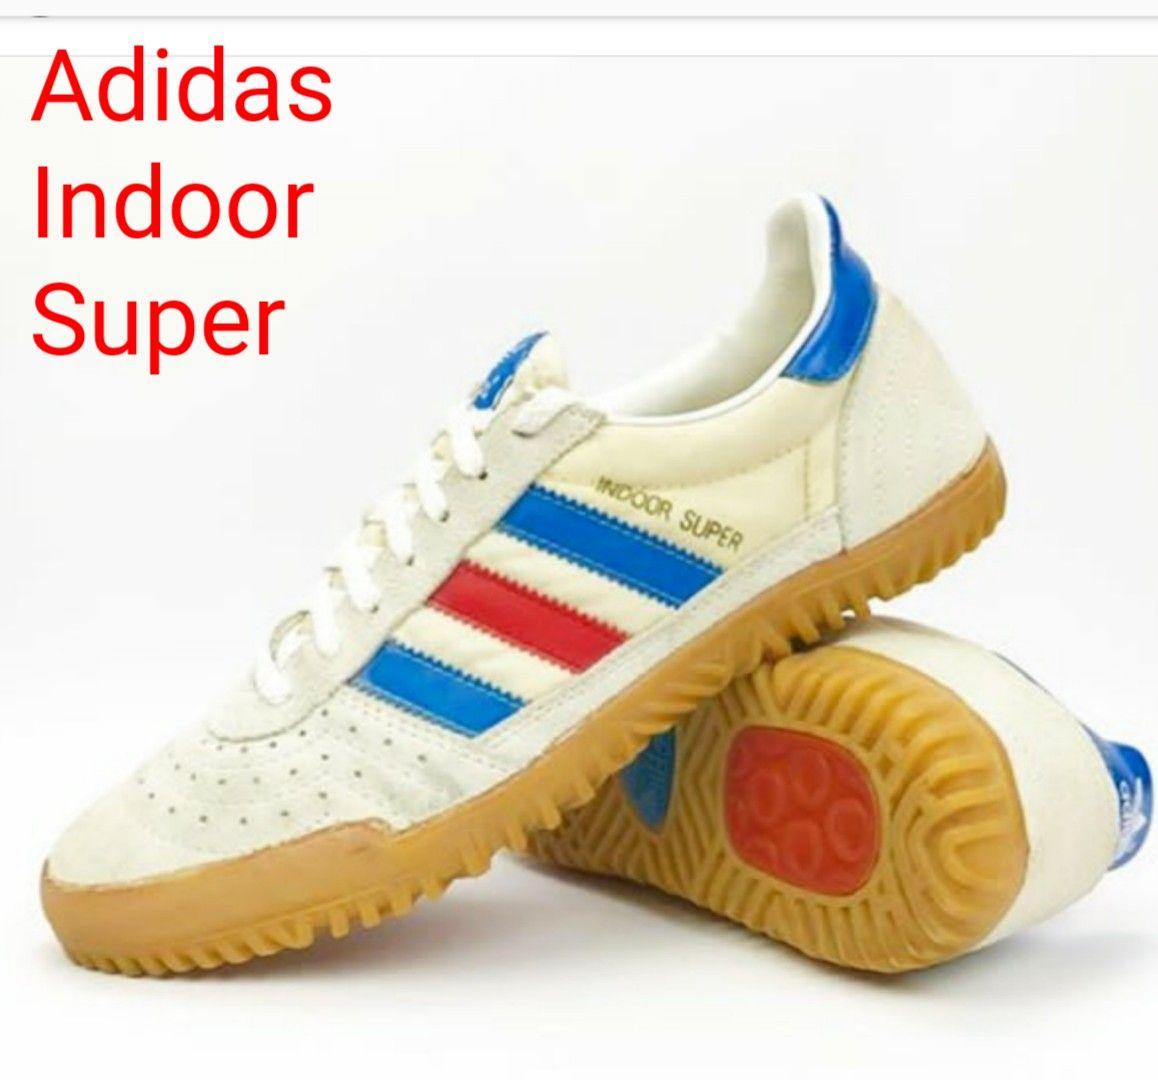 Classic Adidas Indoor Super From 1983 Krossovki In 2019 Krossovki